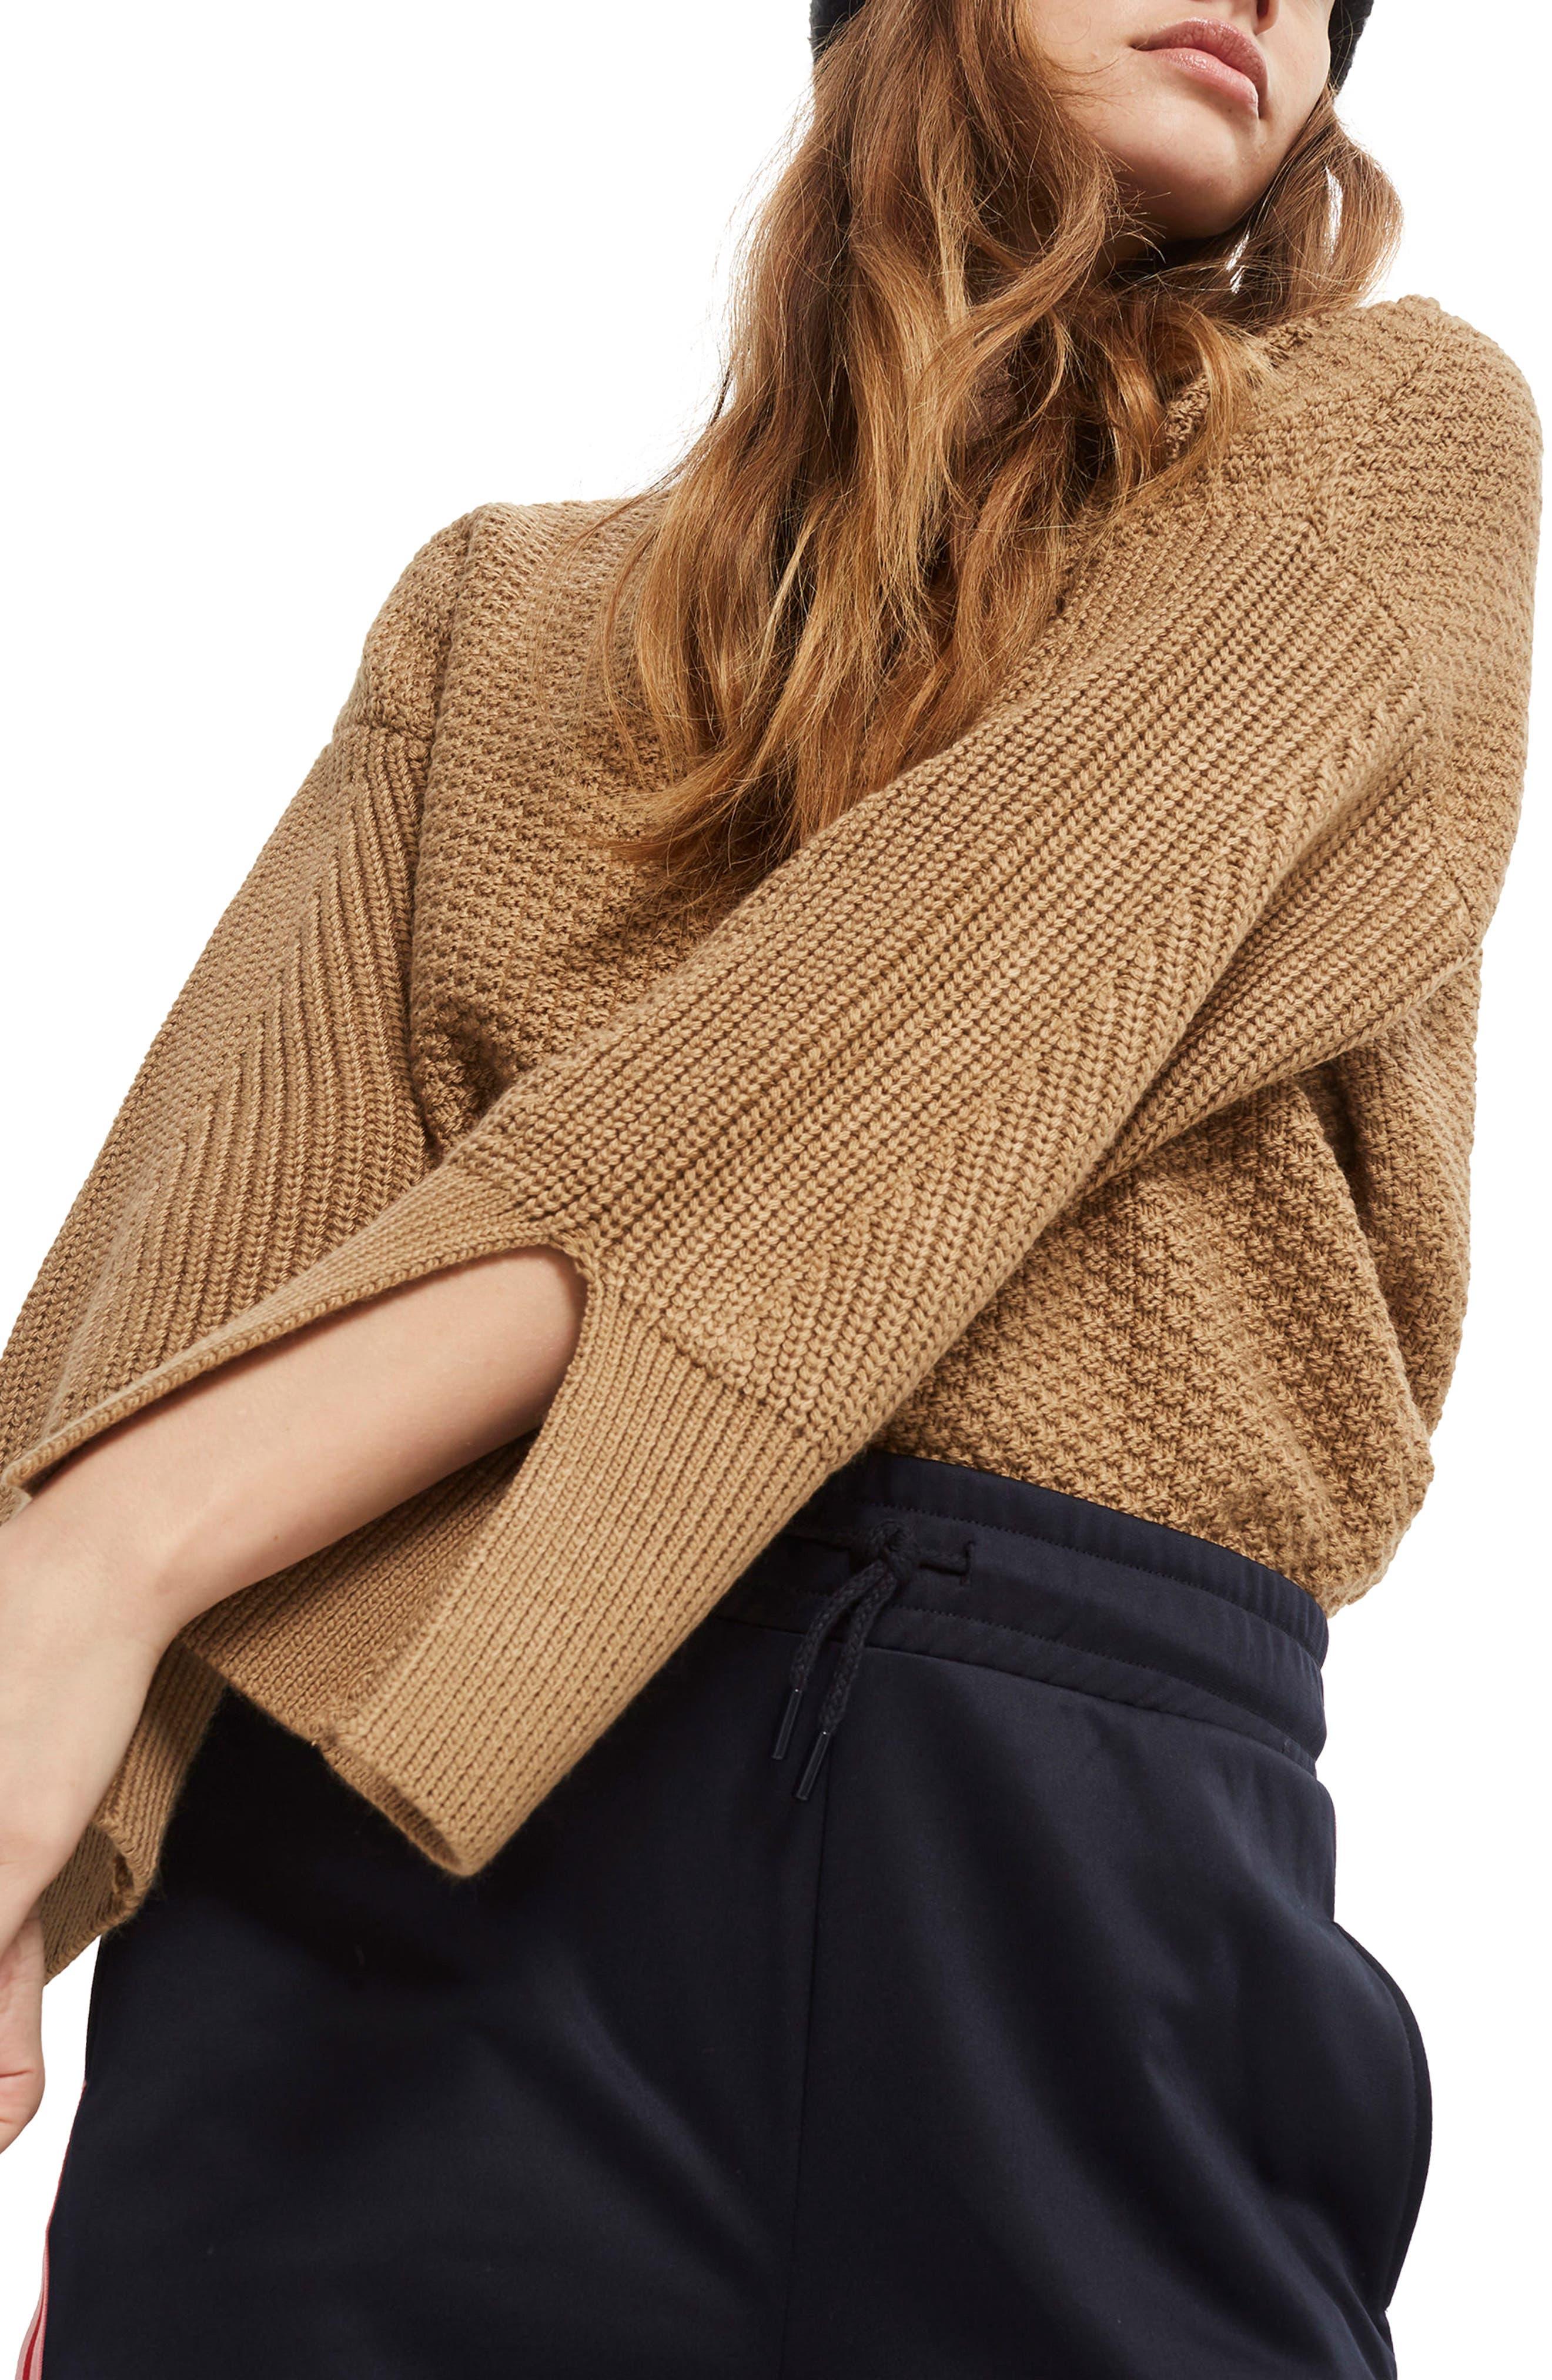 Topshop Petite Moss Stitch Sweater